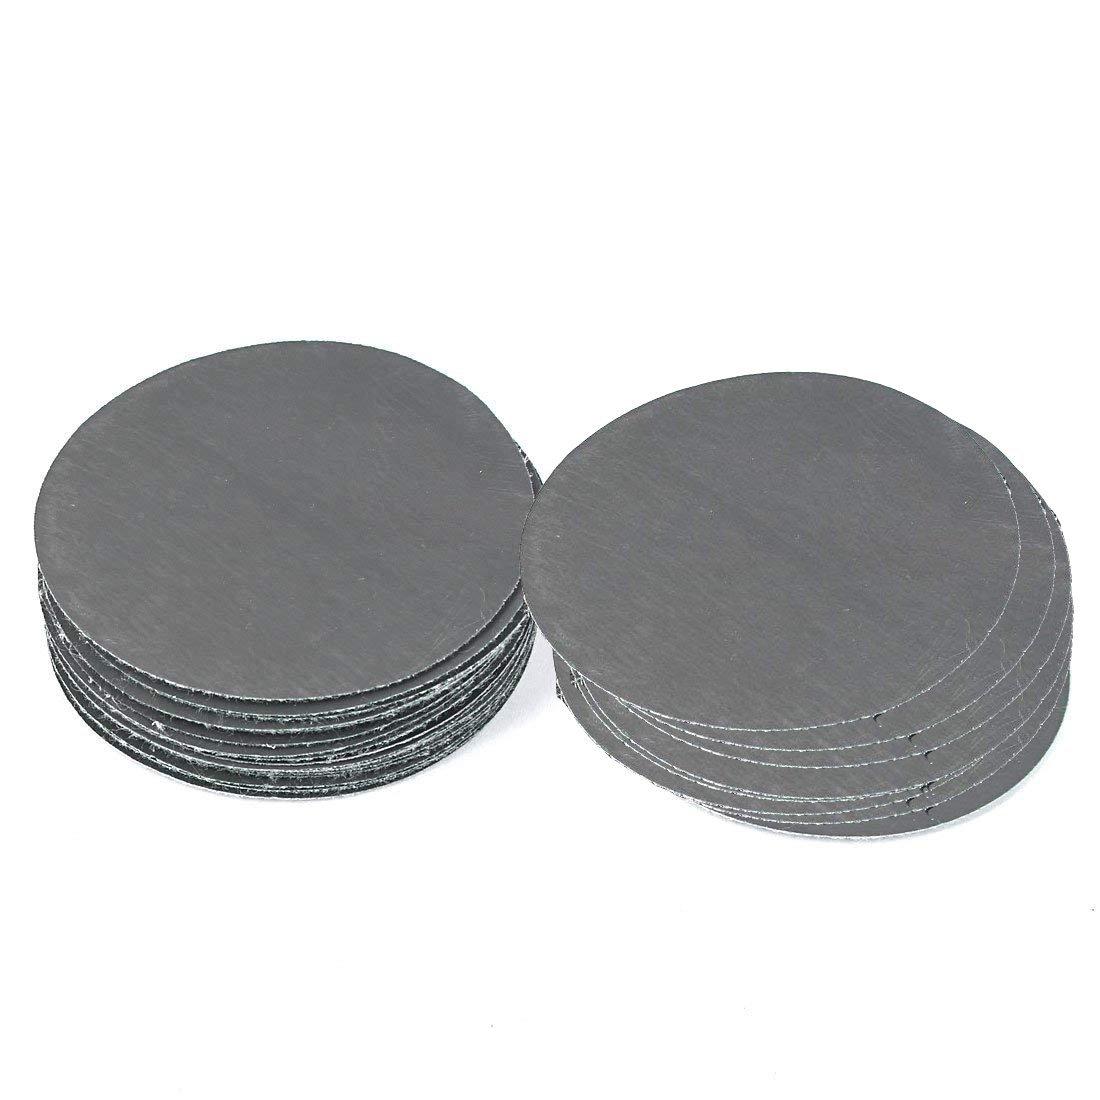 Saim Sanding Discs 60pcs 120 Grit Premium Aluminum Oxide Grain Can Sanding Wood Amber Aluminum Non-Ferrous Meta Plastic Fiberglass Painted Surfaces Mirror 3 inch PSA Sanding Discs